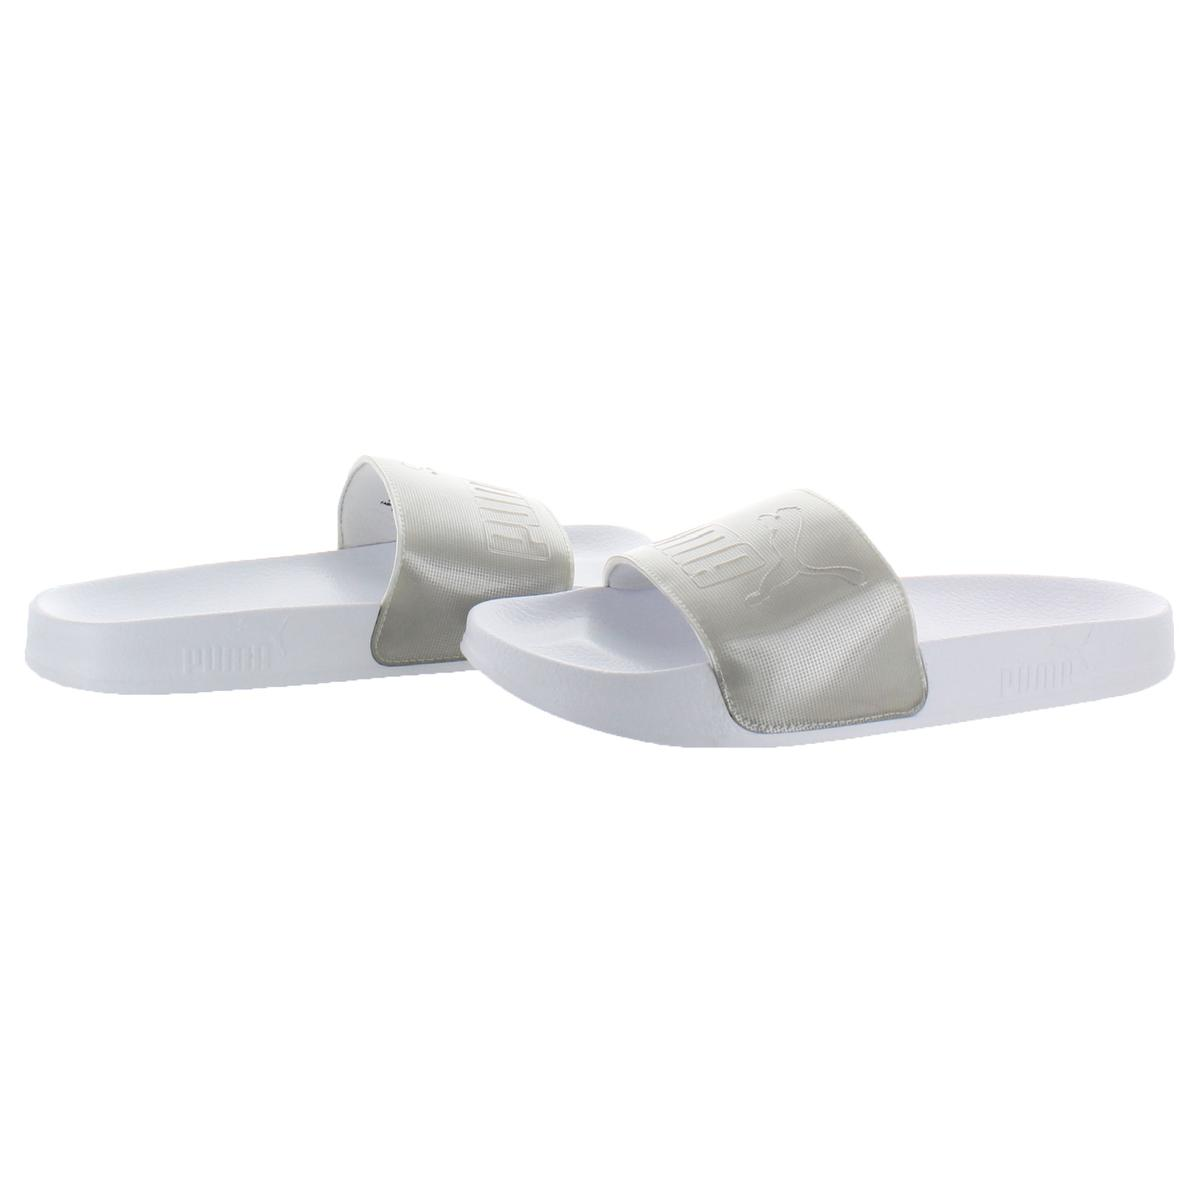 fc81b52f0cc Puma Leadcat EP Women s Branded Padded Strap EVA Pool Slide Sandals ...